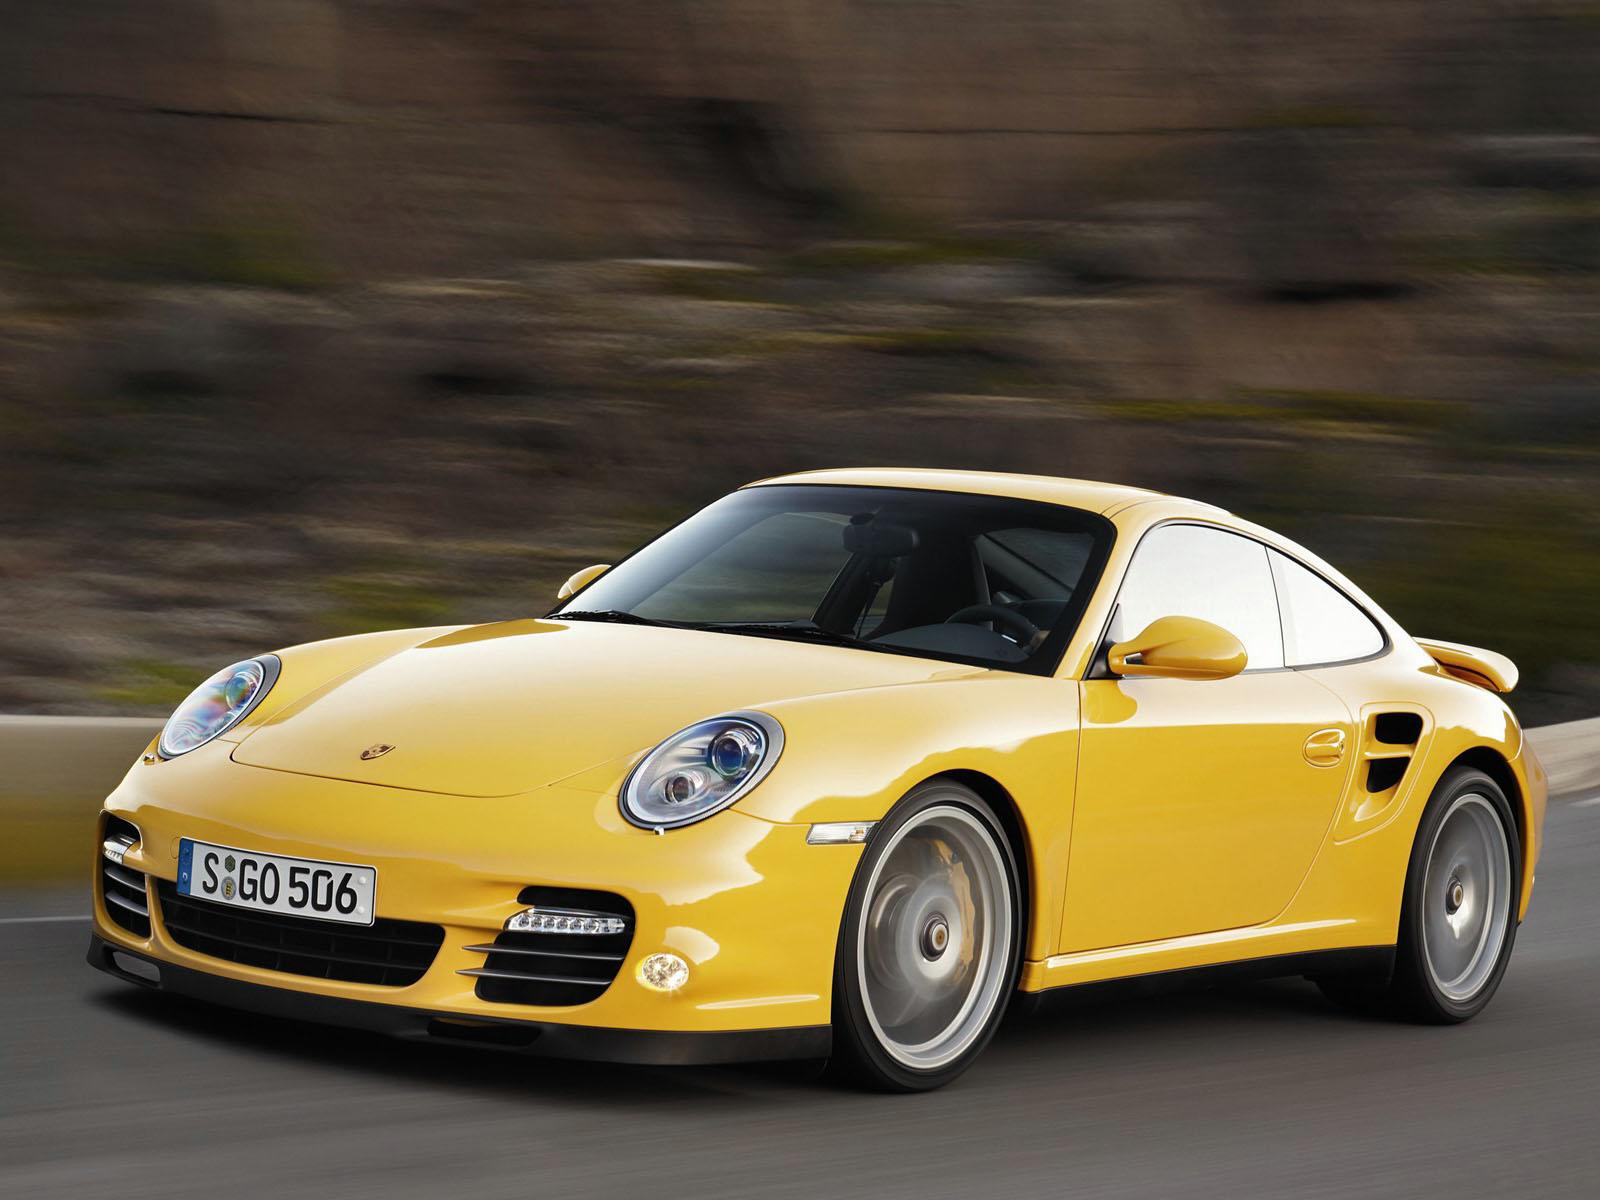 Car Wallpapers Porsche 911Turbo Car Desktop Wallpapers Porsche 911 1600x1200